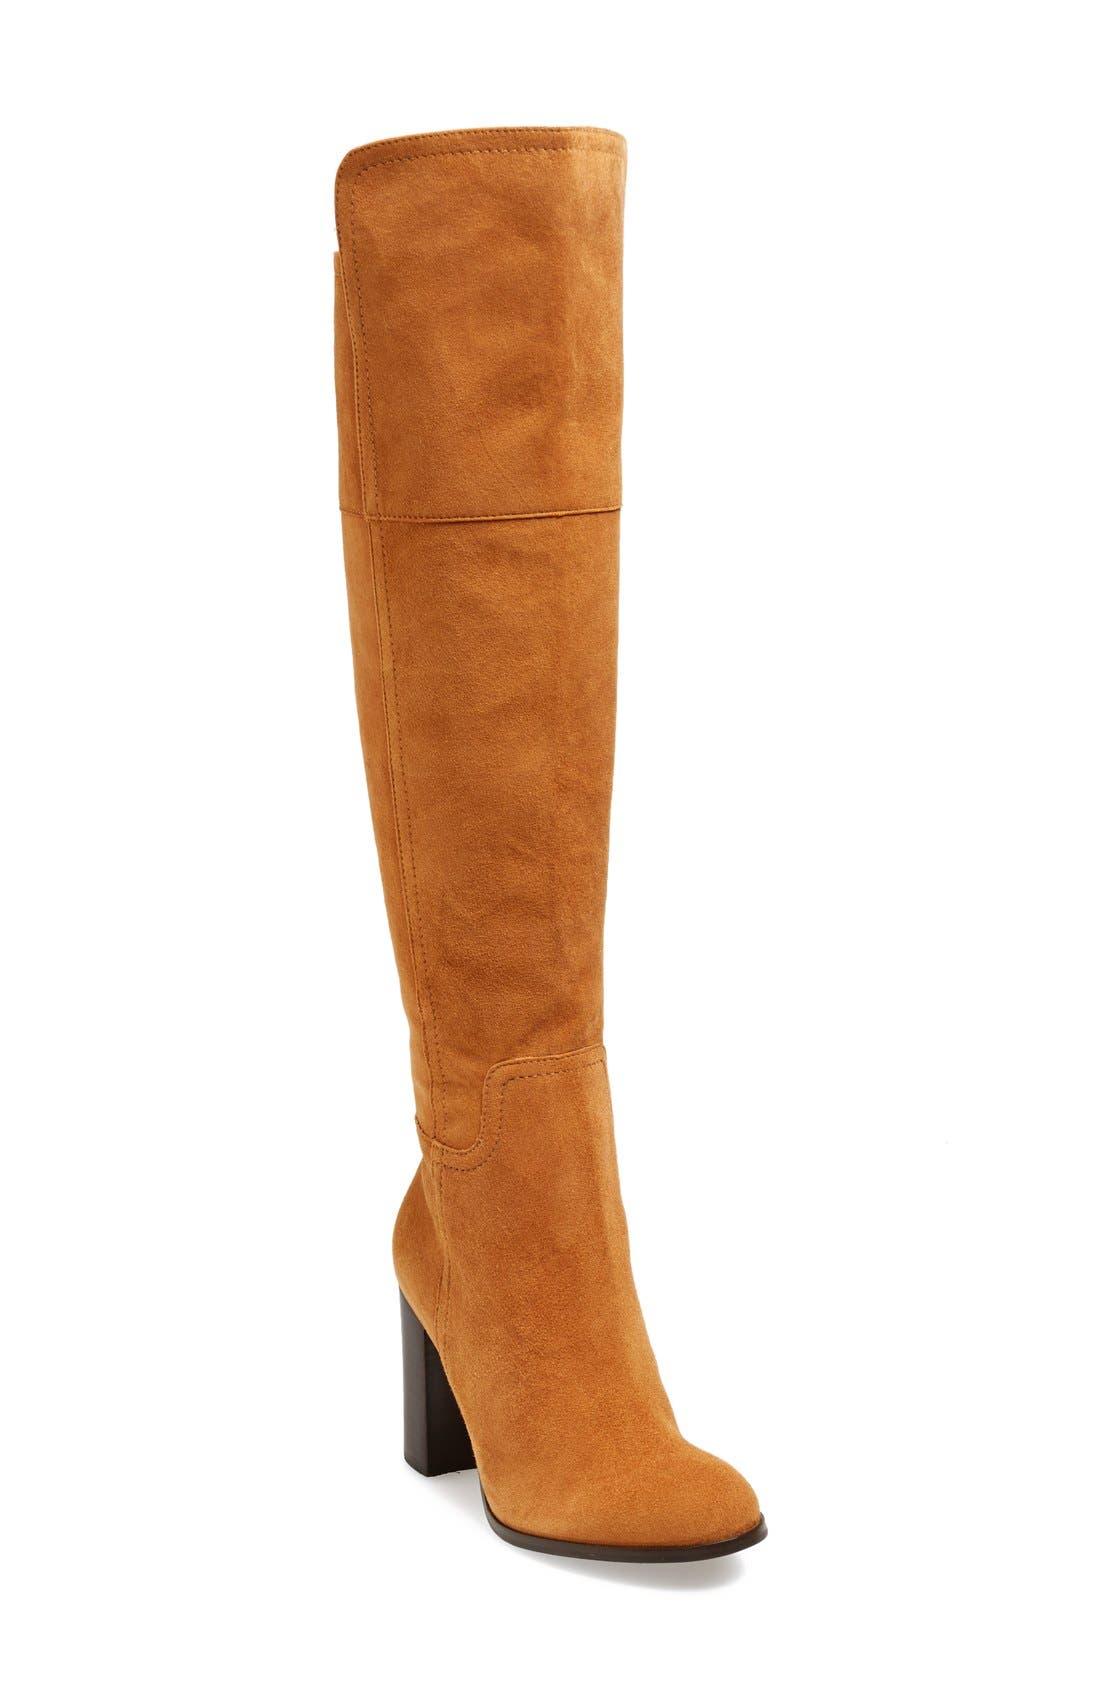 Main Image - Pour la Victoire 'Talia' Suede Tall Boot (Women)